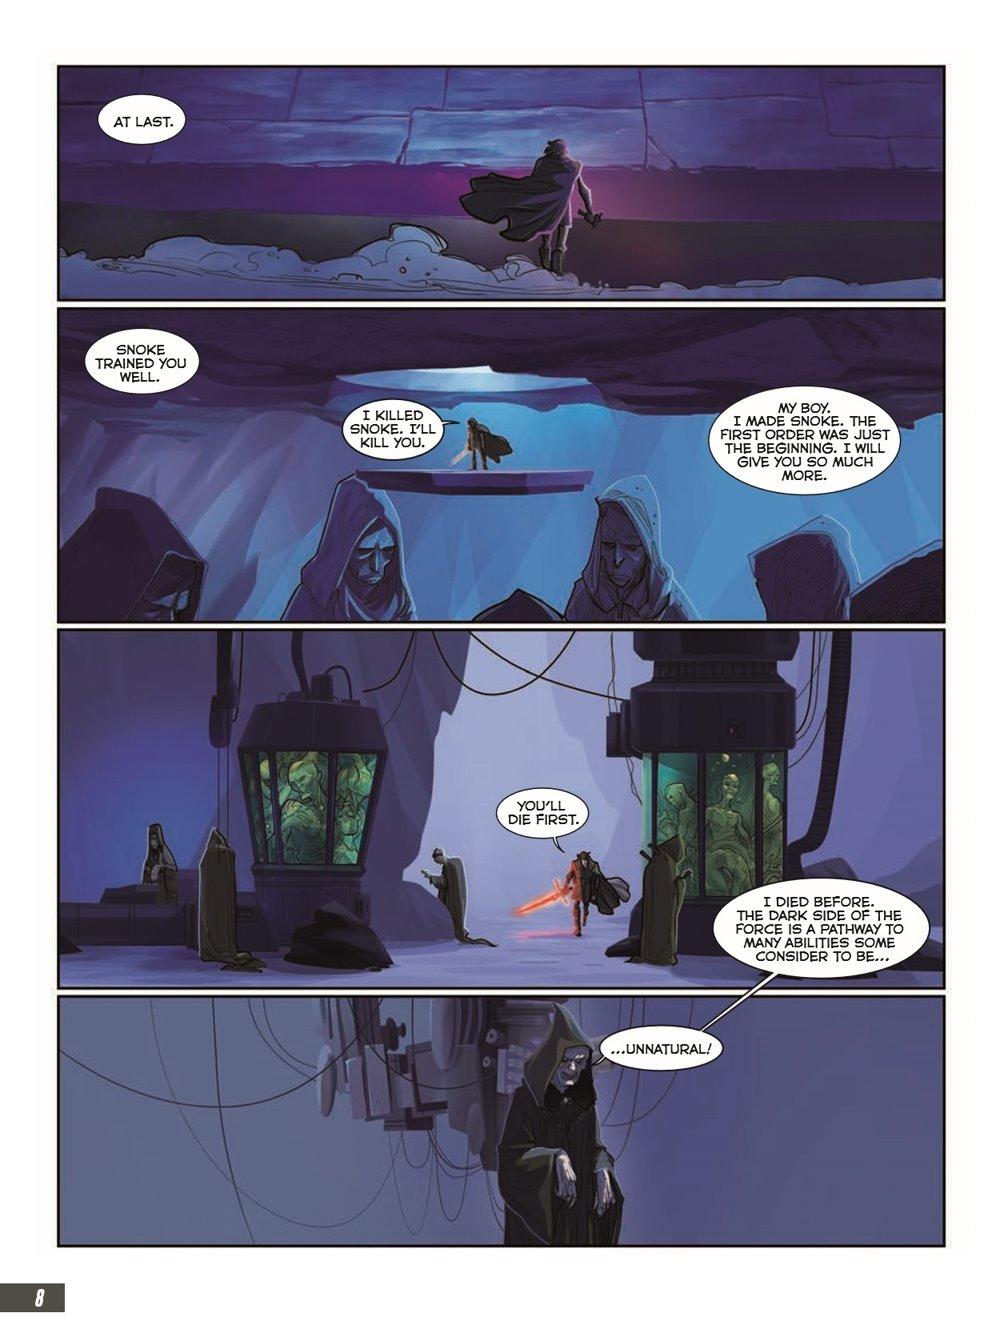 StarWars_IX_TheRiseOfSkywalker_pr-4 ComicList Previews: STAR WARS THE RISE OF SKYWALKER GN